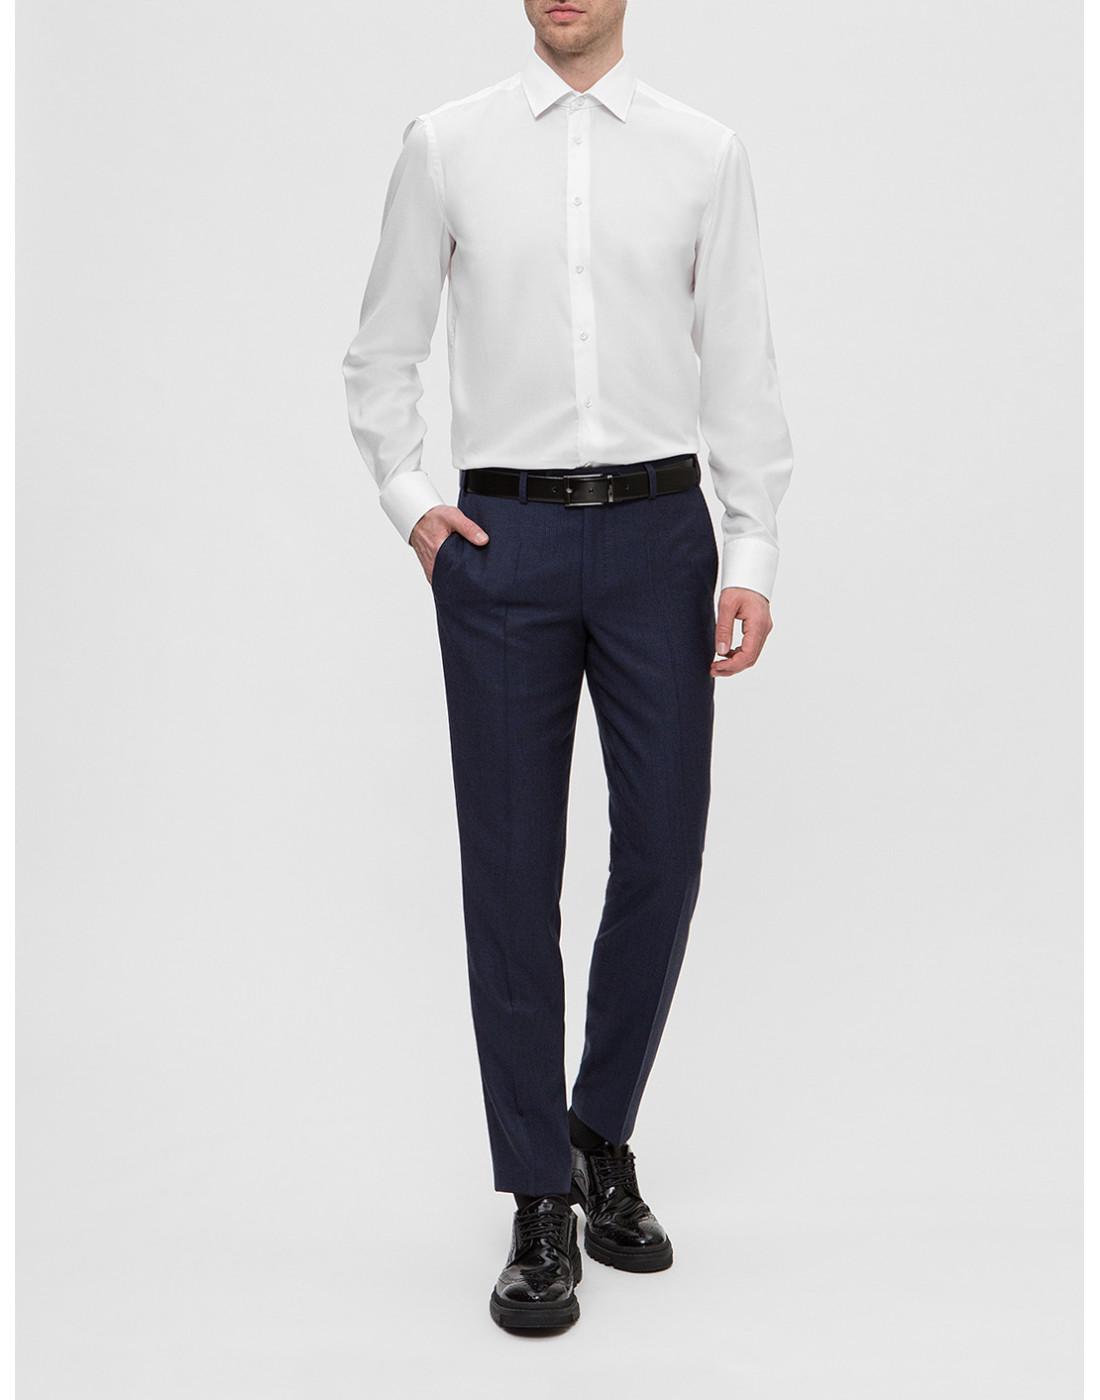 Мужская белая рубашка Van Laack S150021/000-5